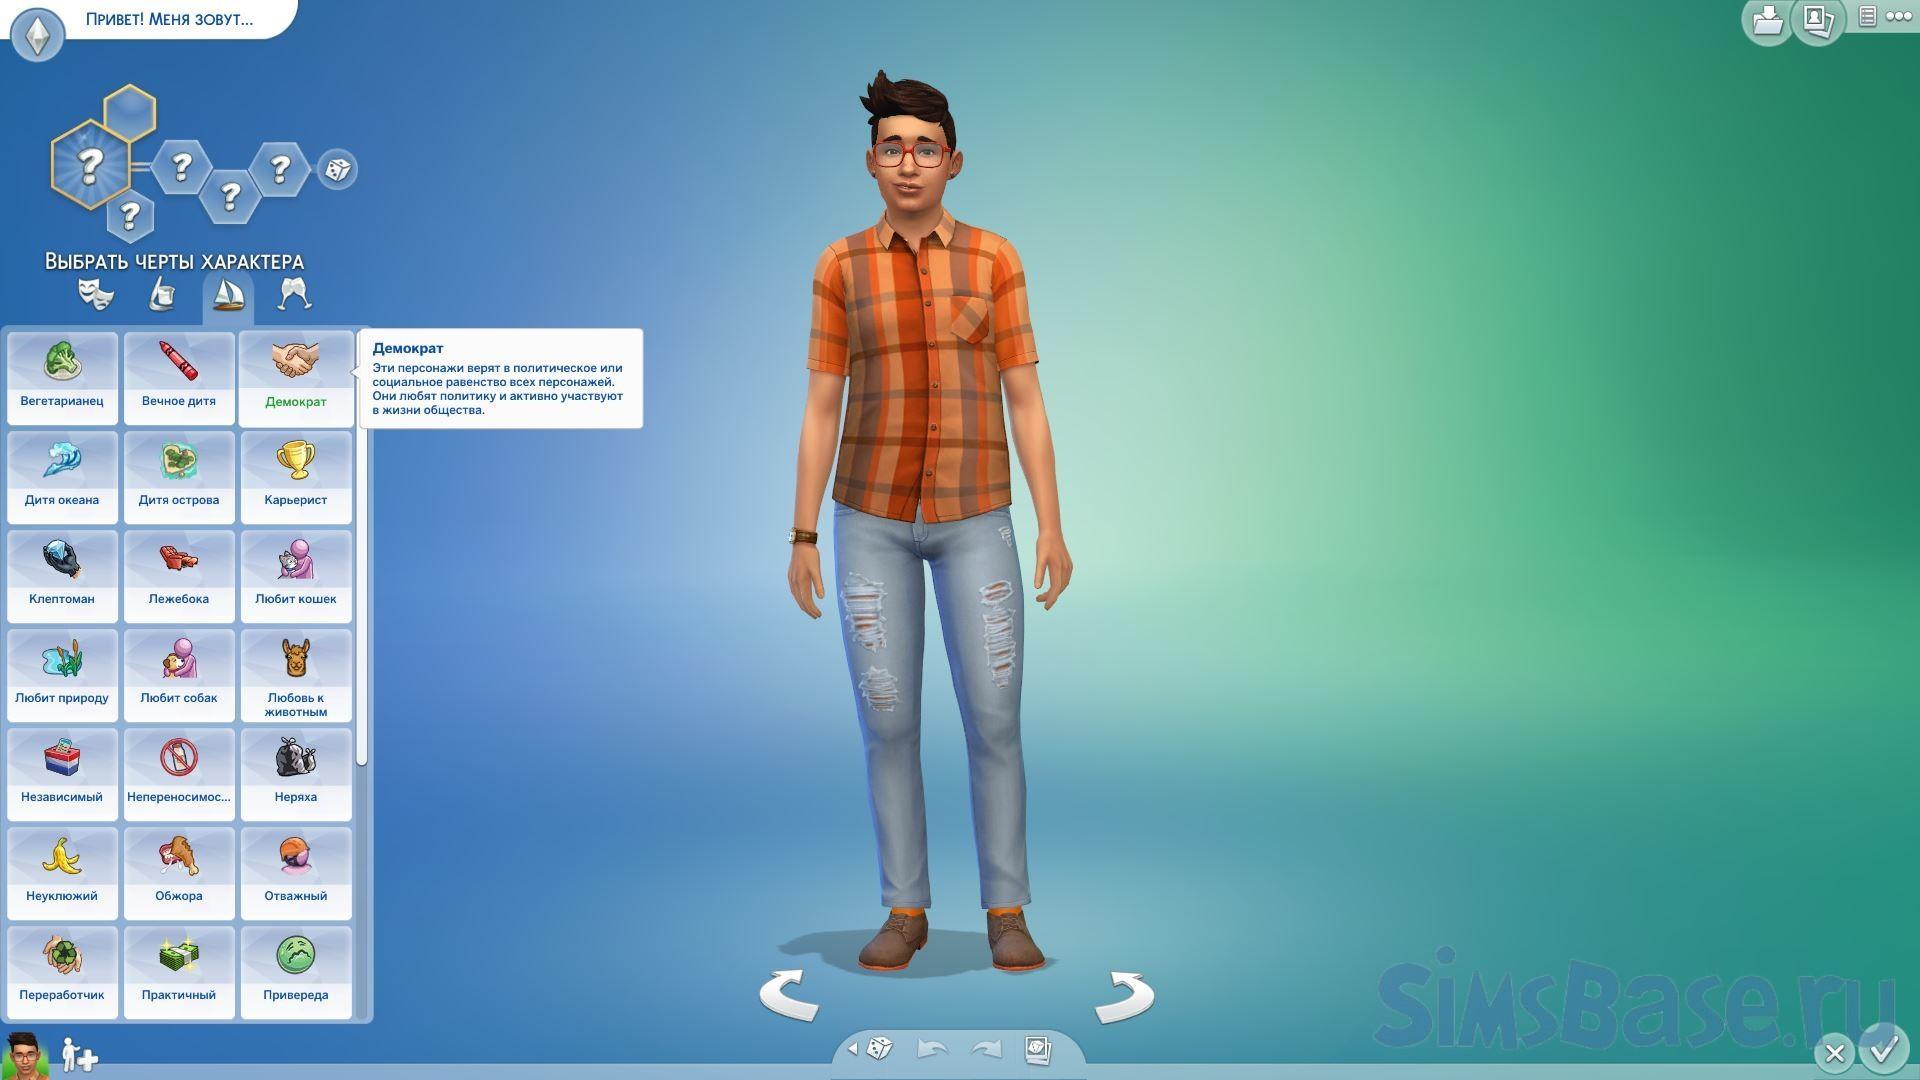 Мод «Набор черт характера мировоззрений» от Kiara для Sims 4